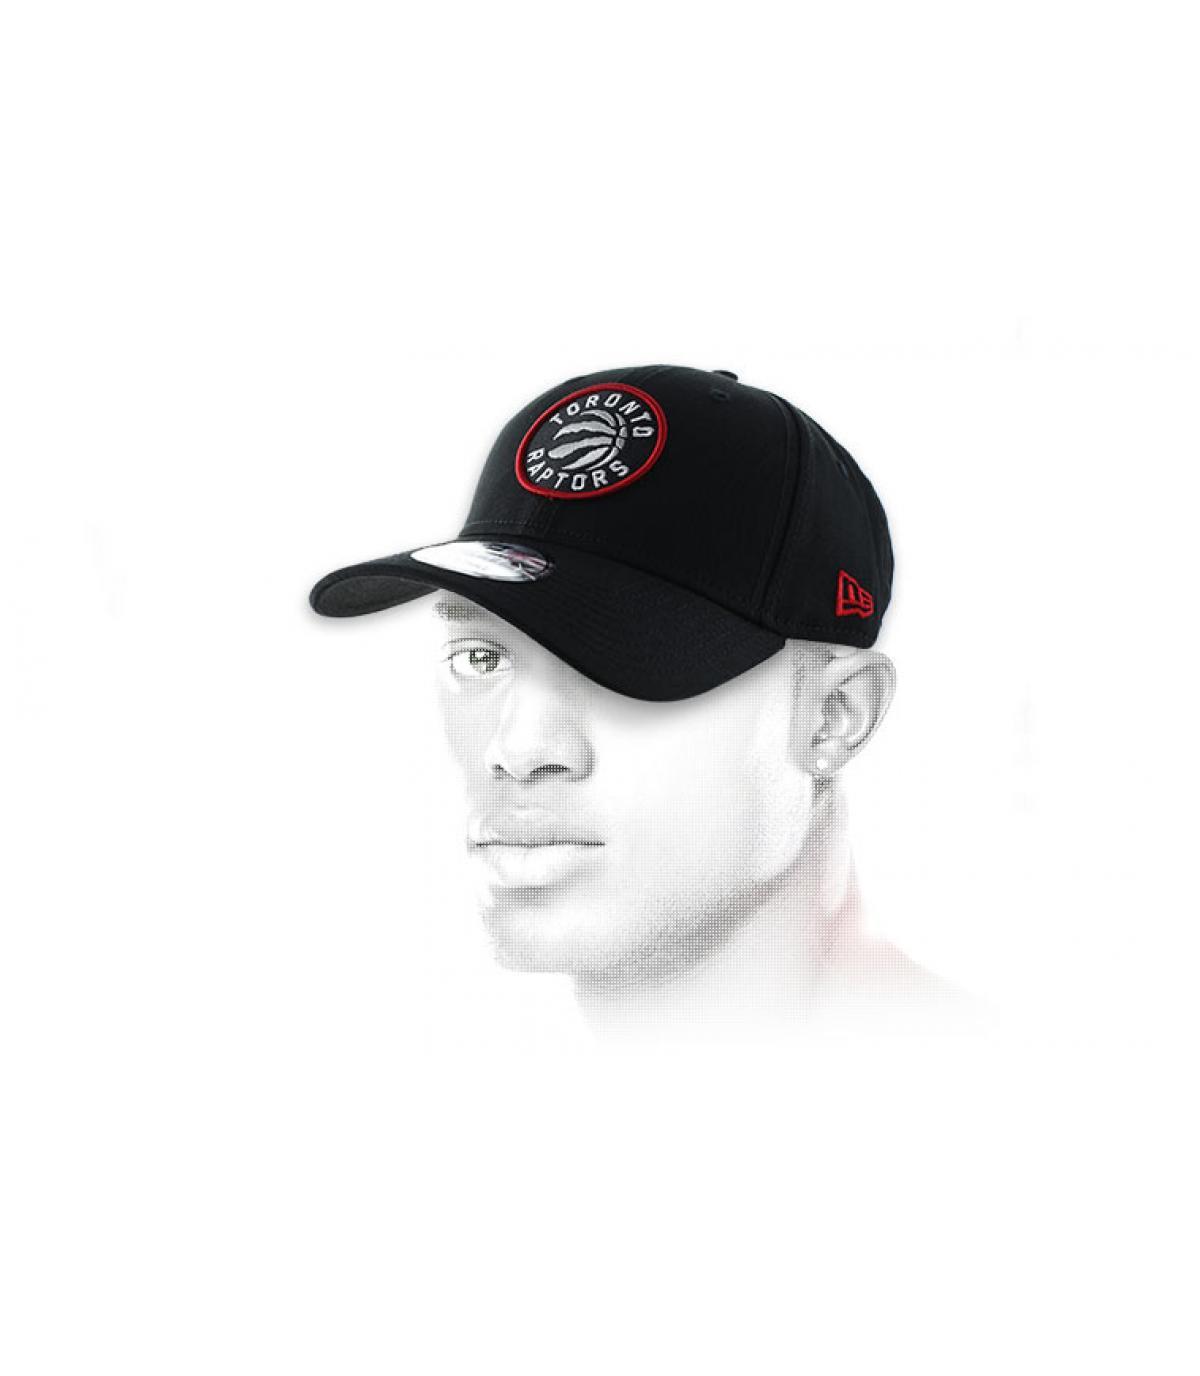 Toronto Raptors cap